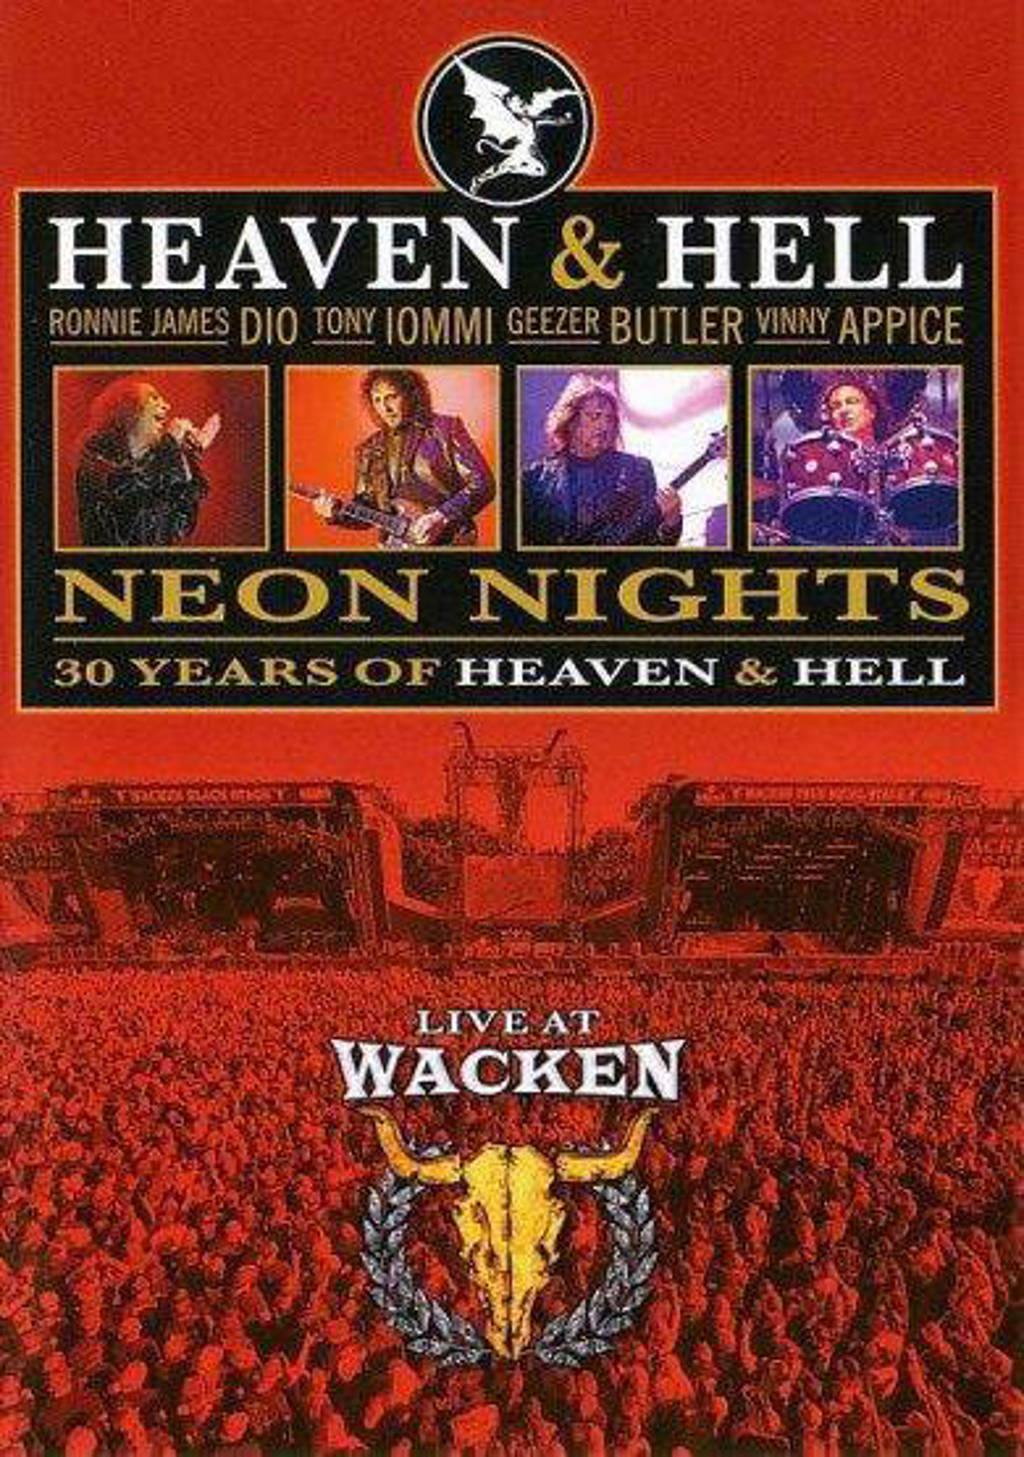 Heaven & Hell - Neon Nights - Live At Wacken (DVD)